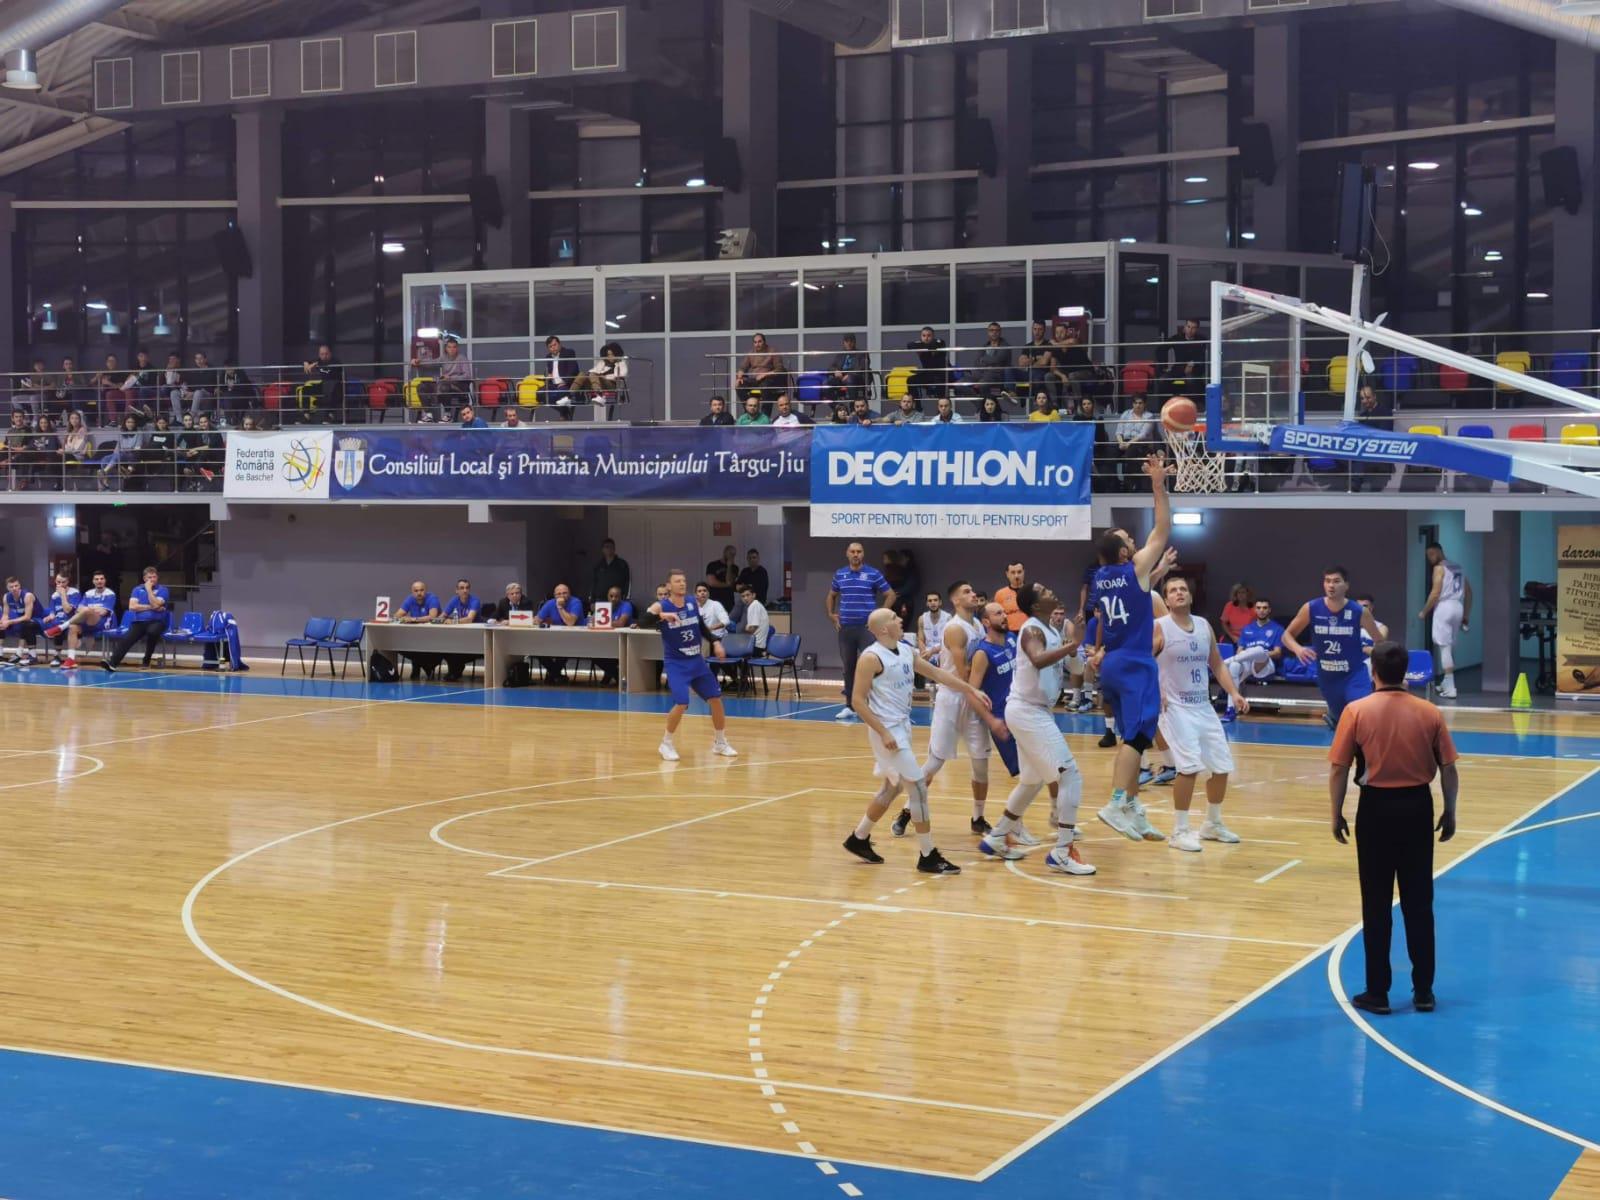 Baschetbaliștii CSM Mediaș au dominat terenul echipei CSM Tg Jiu, scor final 98-80